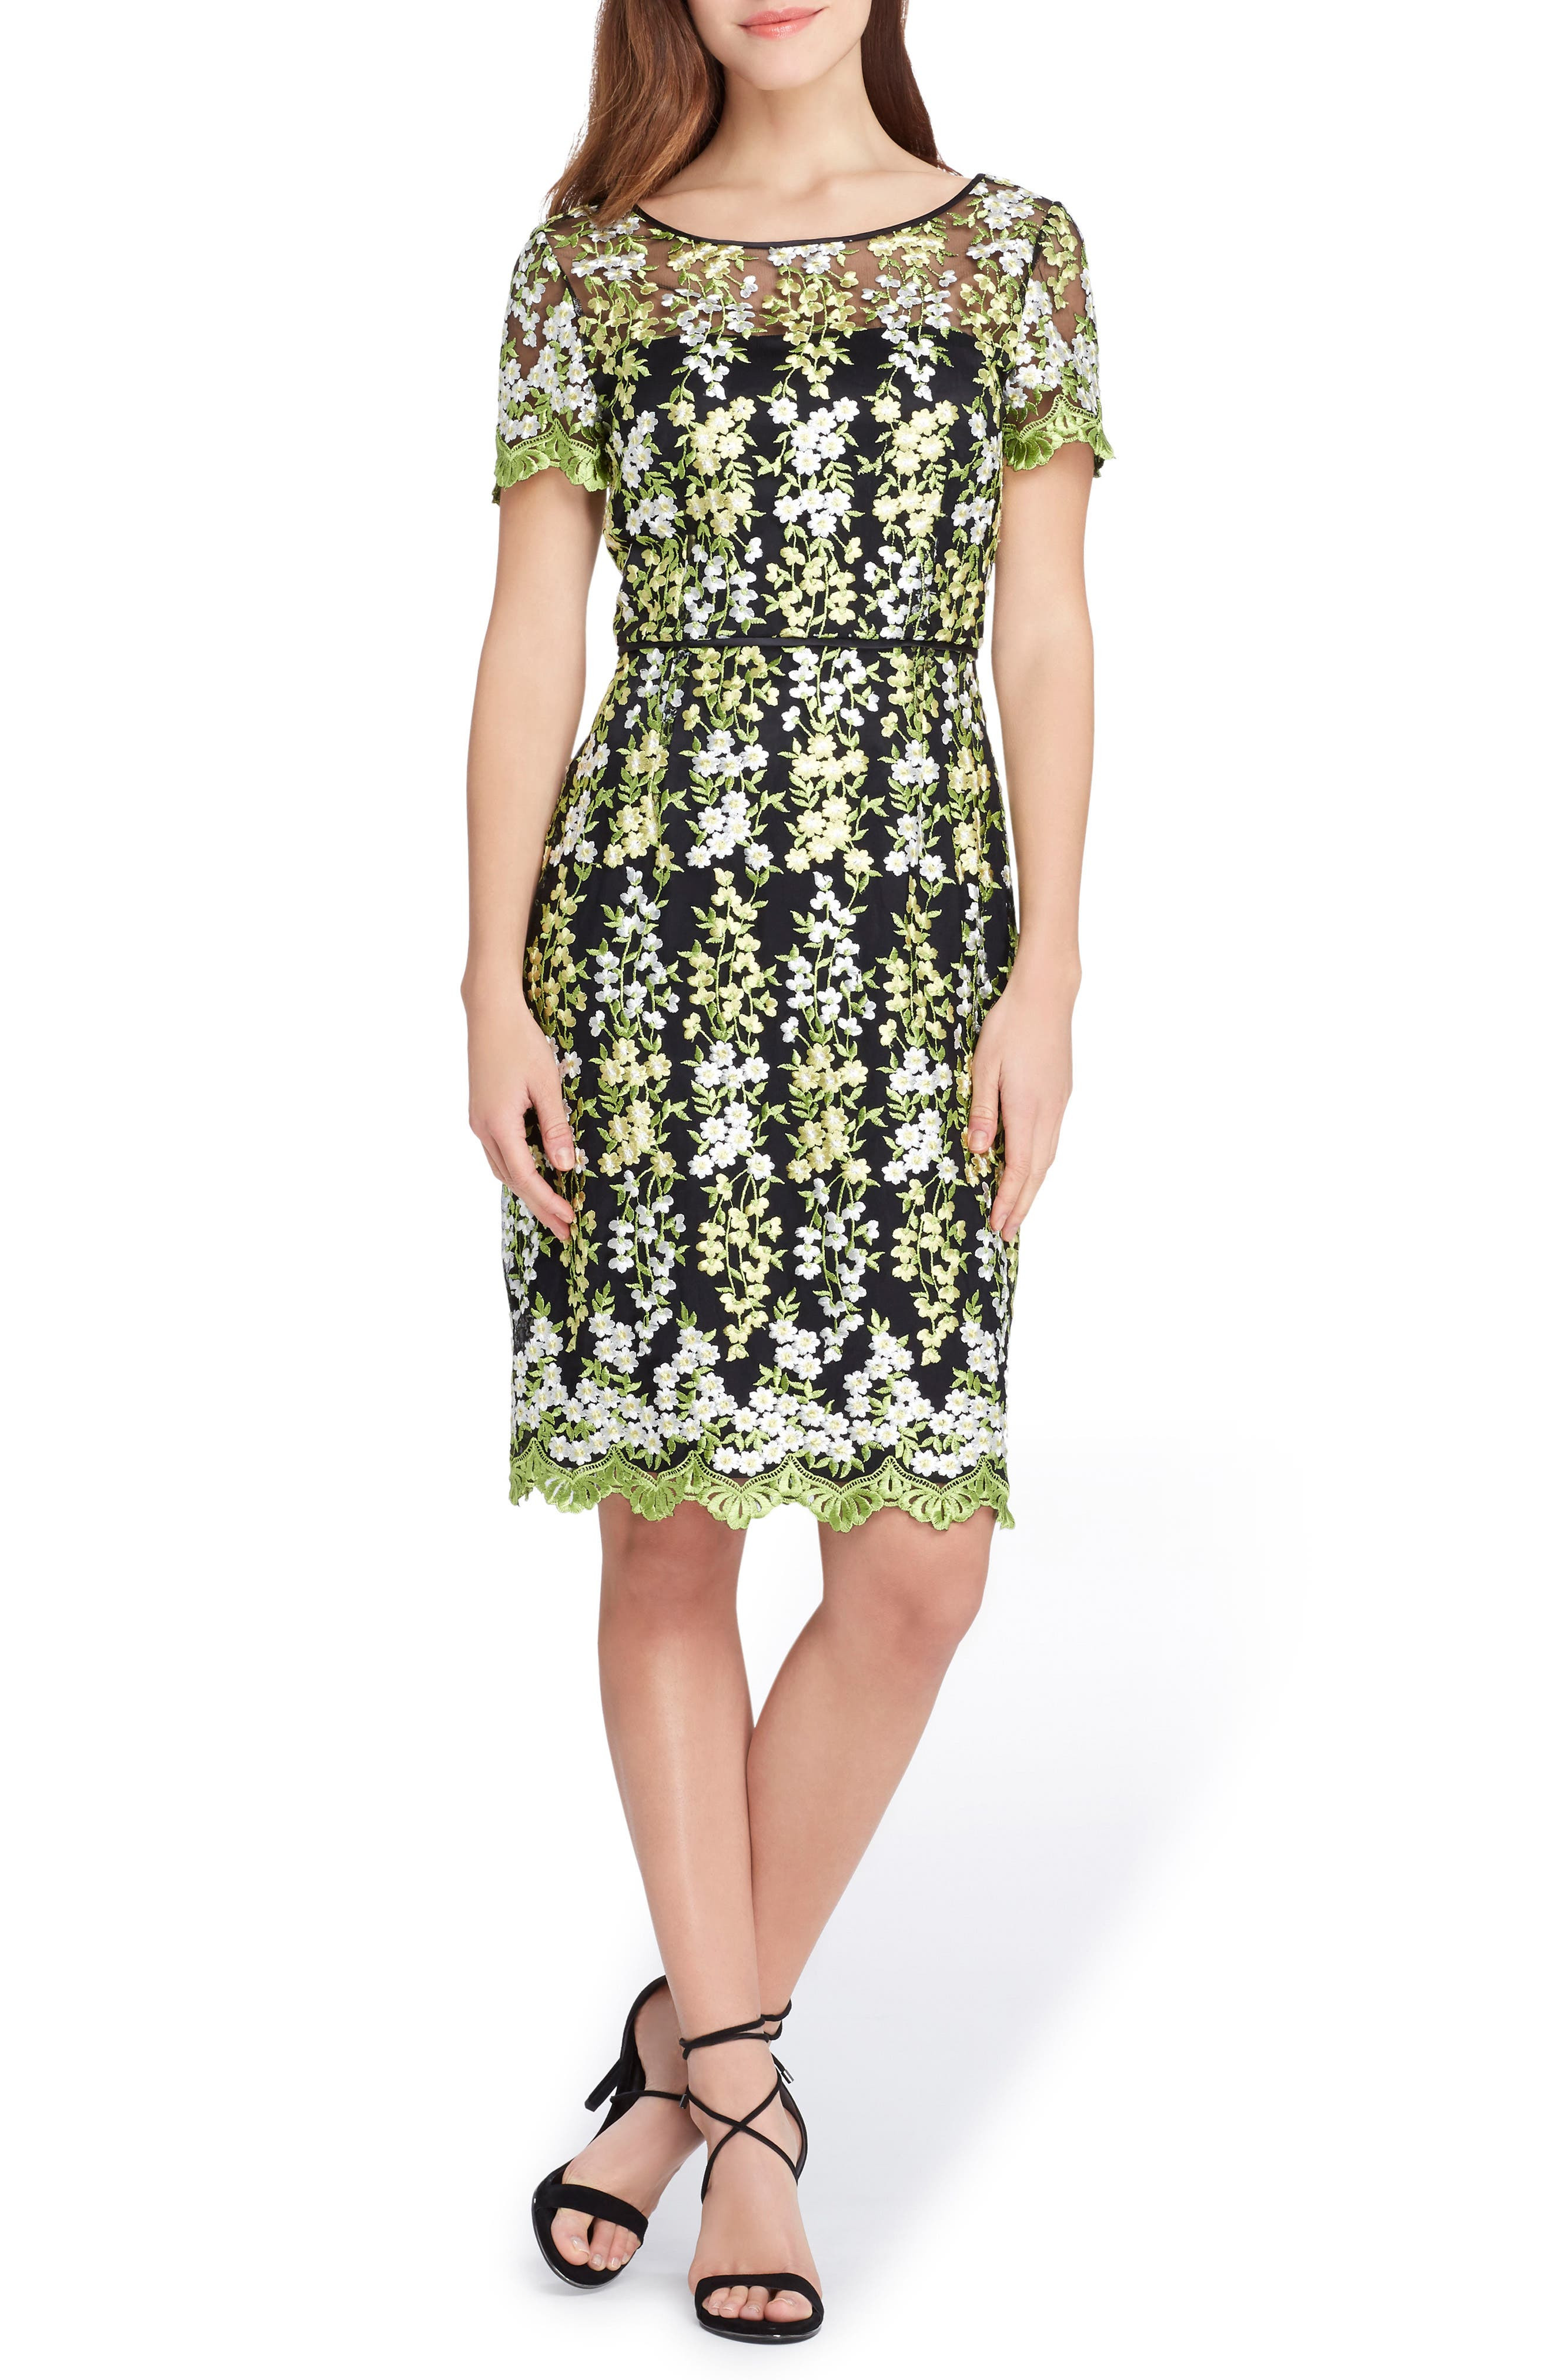 Floral Embroidery Sheath Dress,                         Main,                         color, Black/ Lemon/ Green